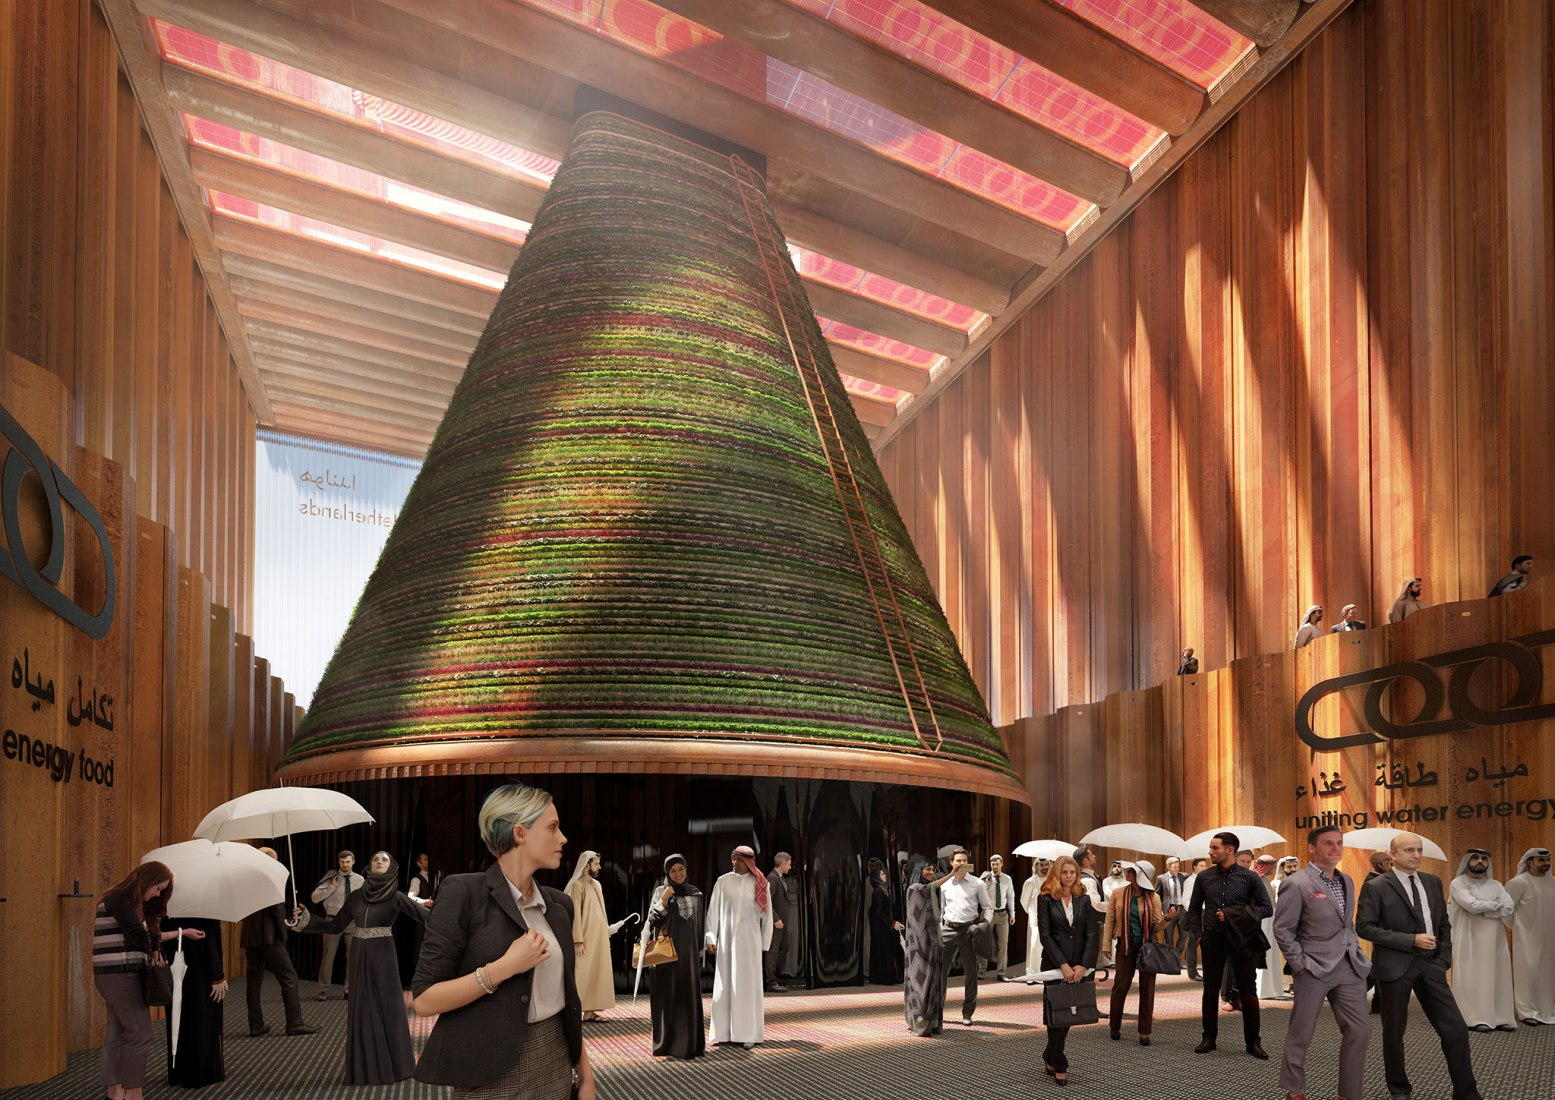 Rendering. Dutch pavilion for Expo 2020 Dubai by V8 architects. Image courtesy of V8 architects